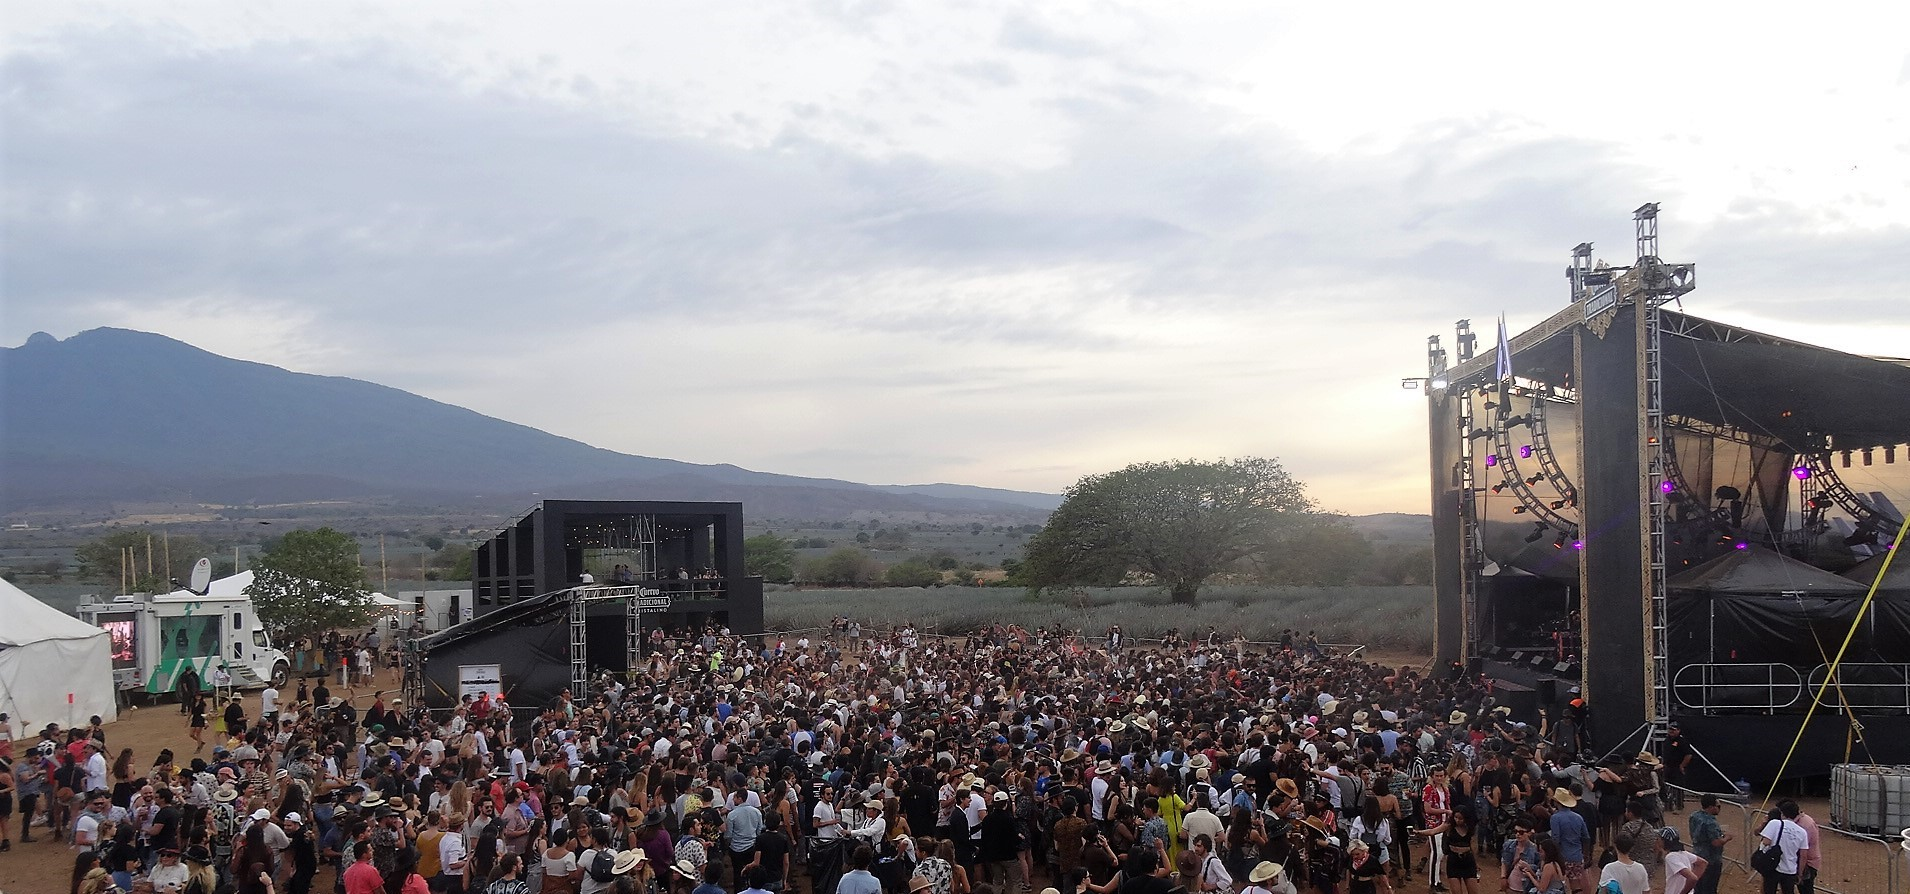 El Festival Akamba repite su exitosa fórmula